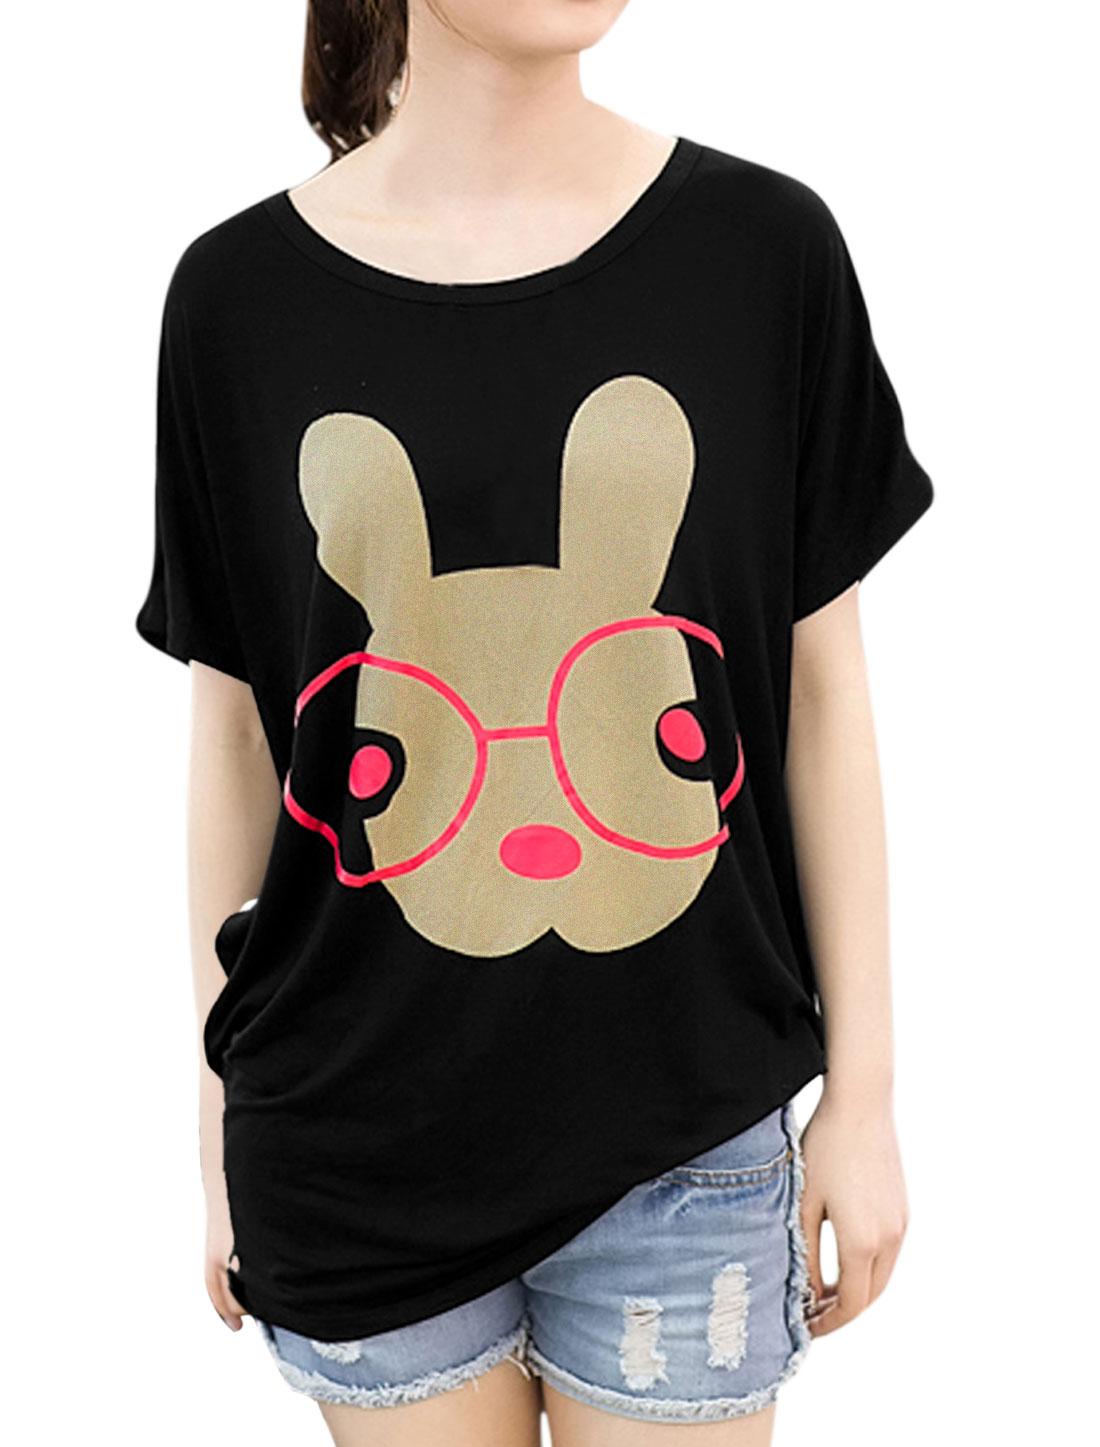 Ladies Round Neck Rabbit Print Batwing Short Sleeve Tee Shirt Black XS